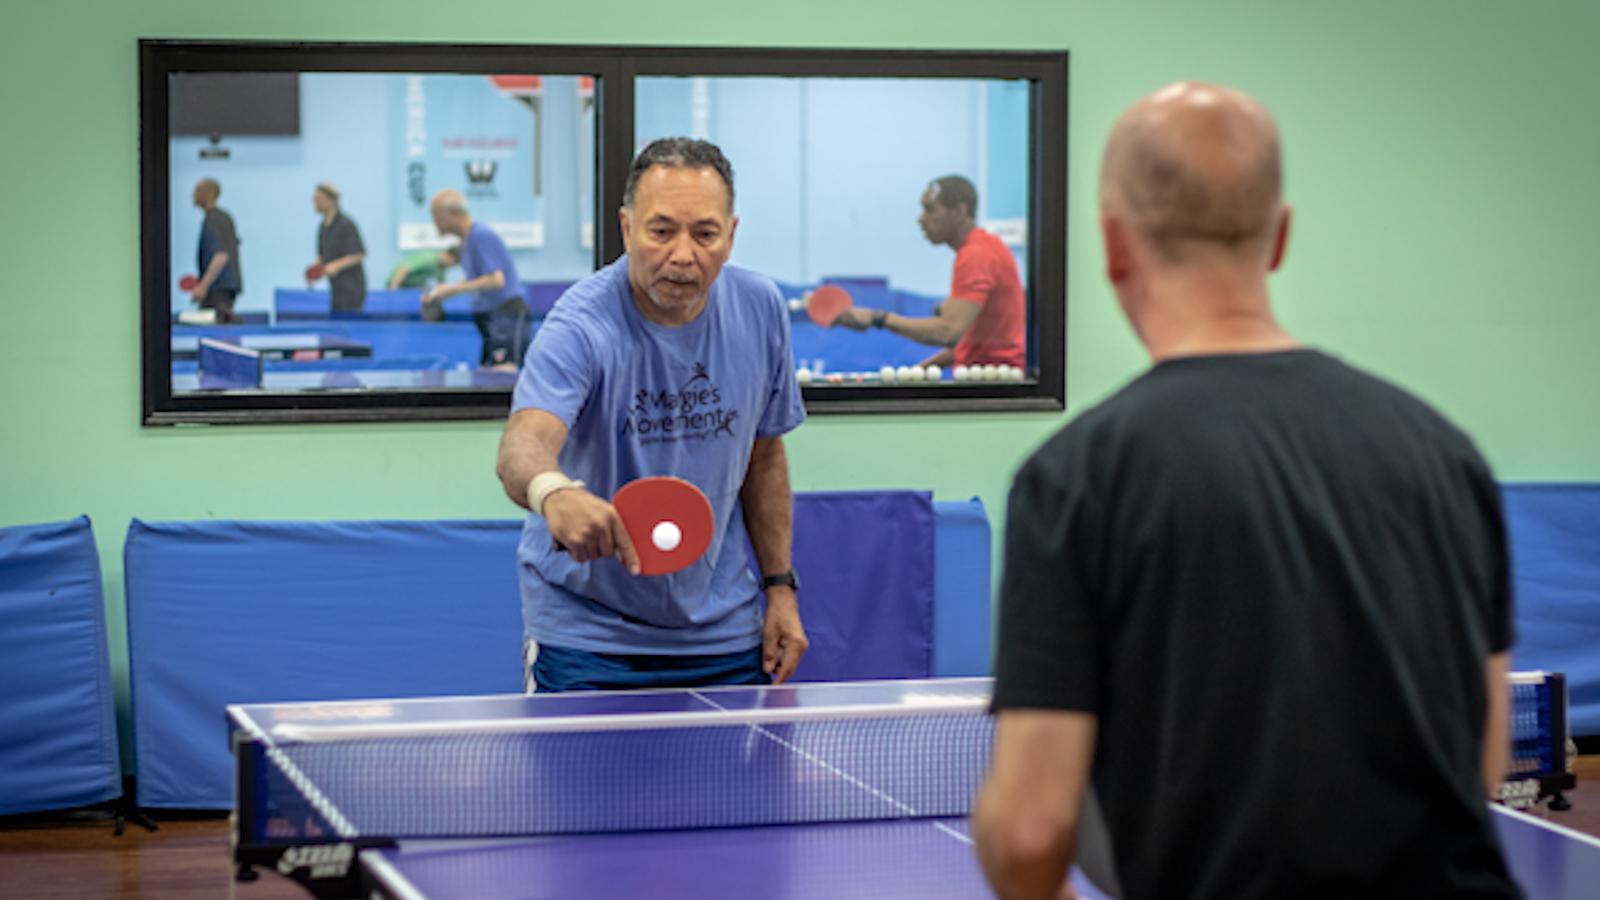 Parkinson patients play ping pong to combat disease symptoms